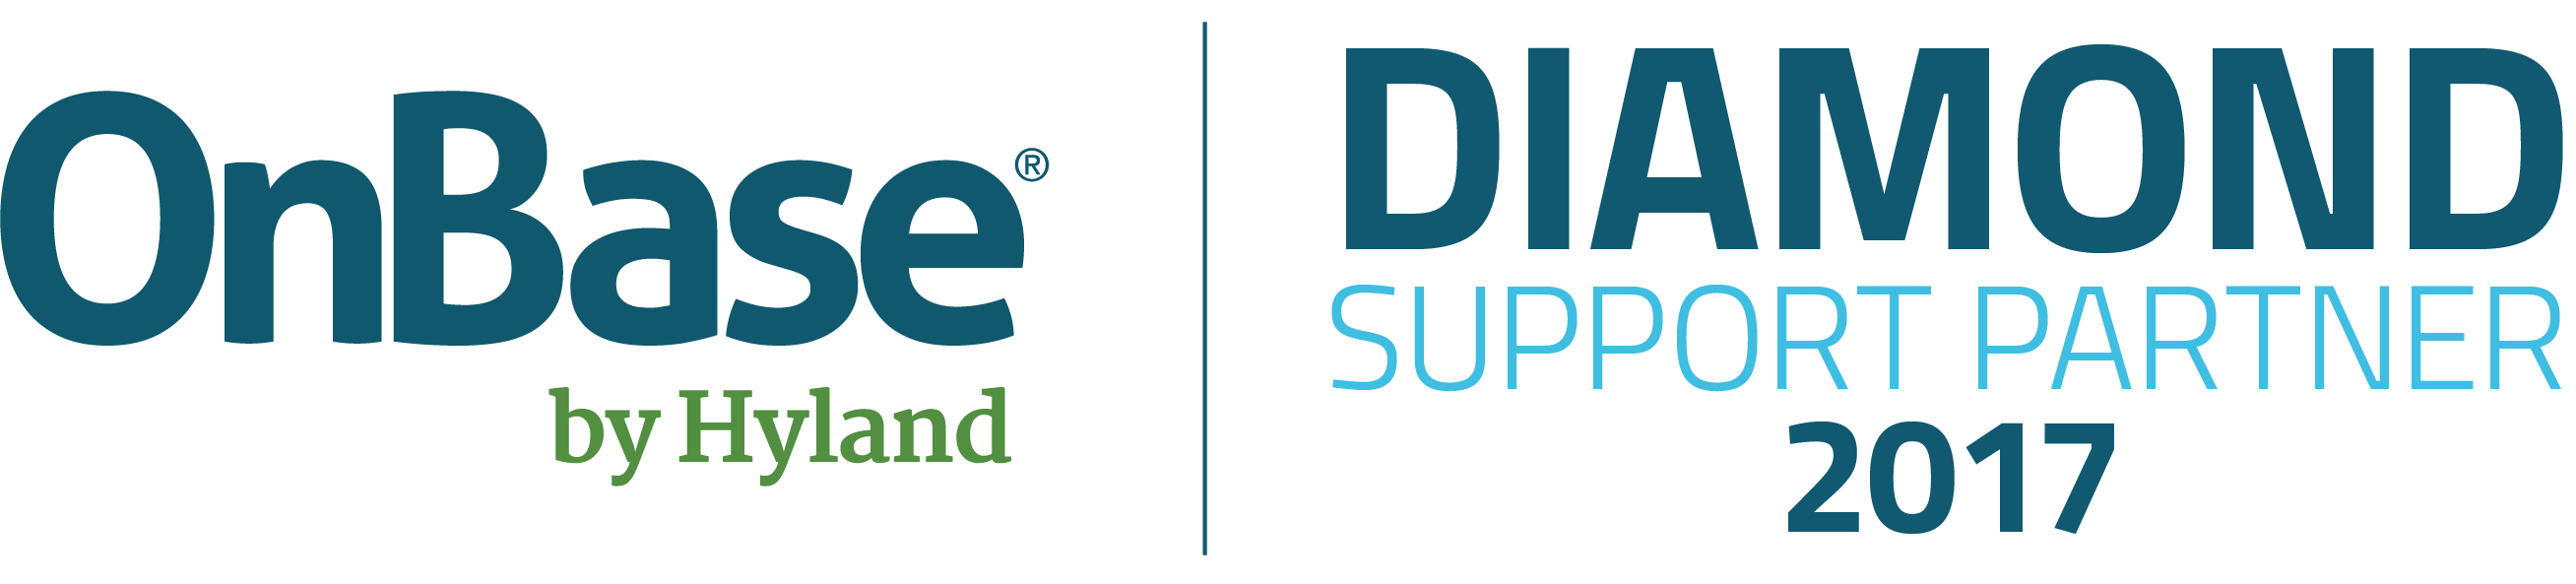 OnBase by Hyland Diamond Support Partner